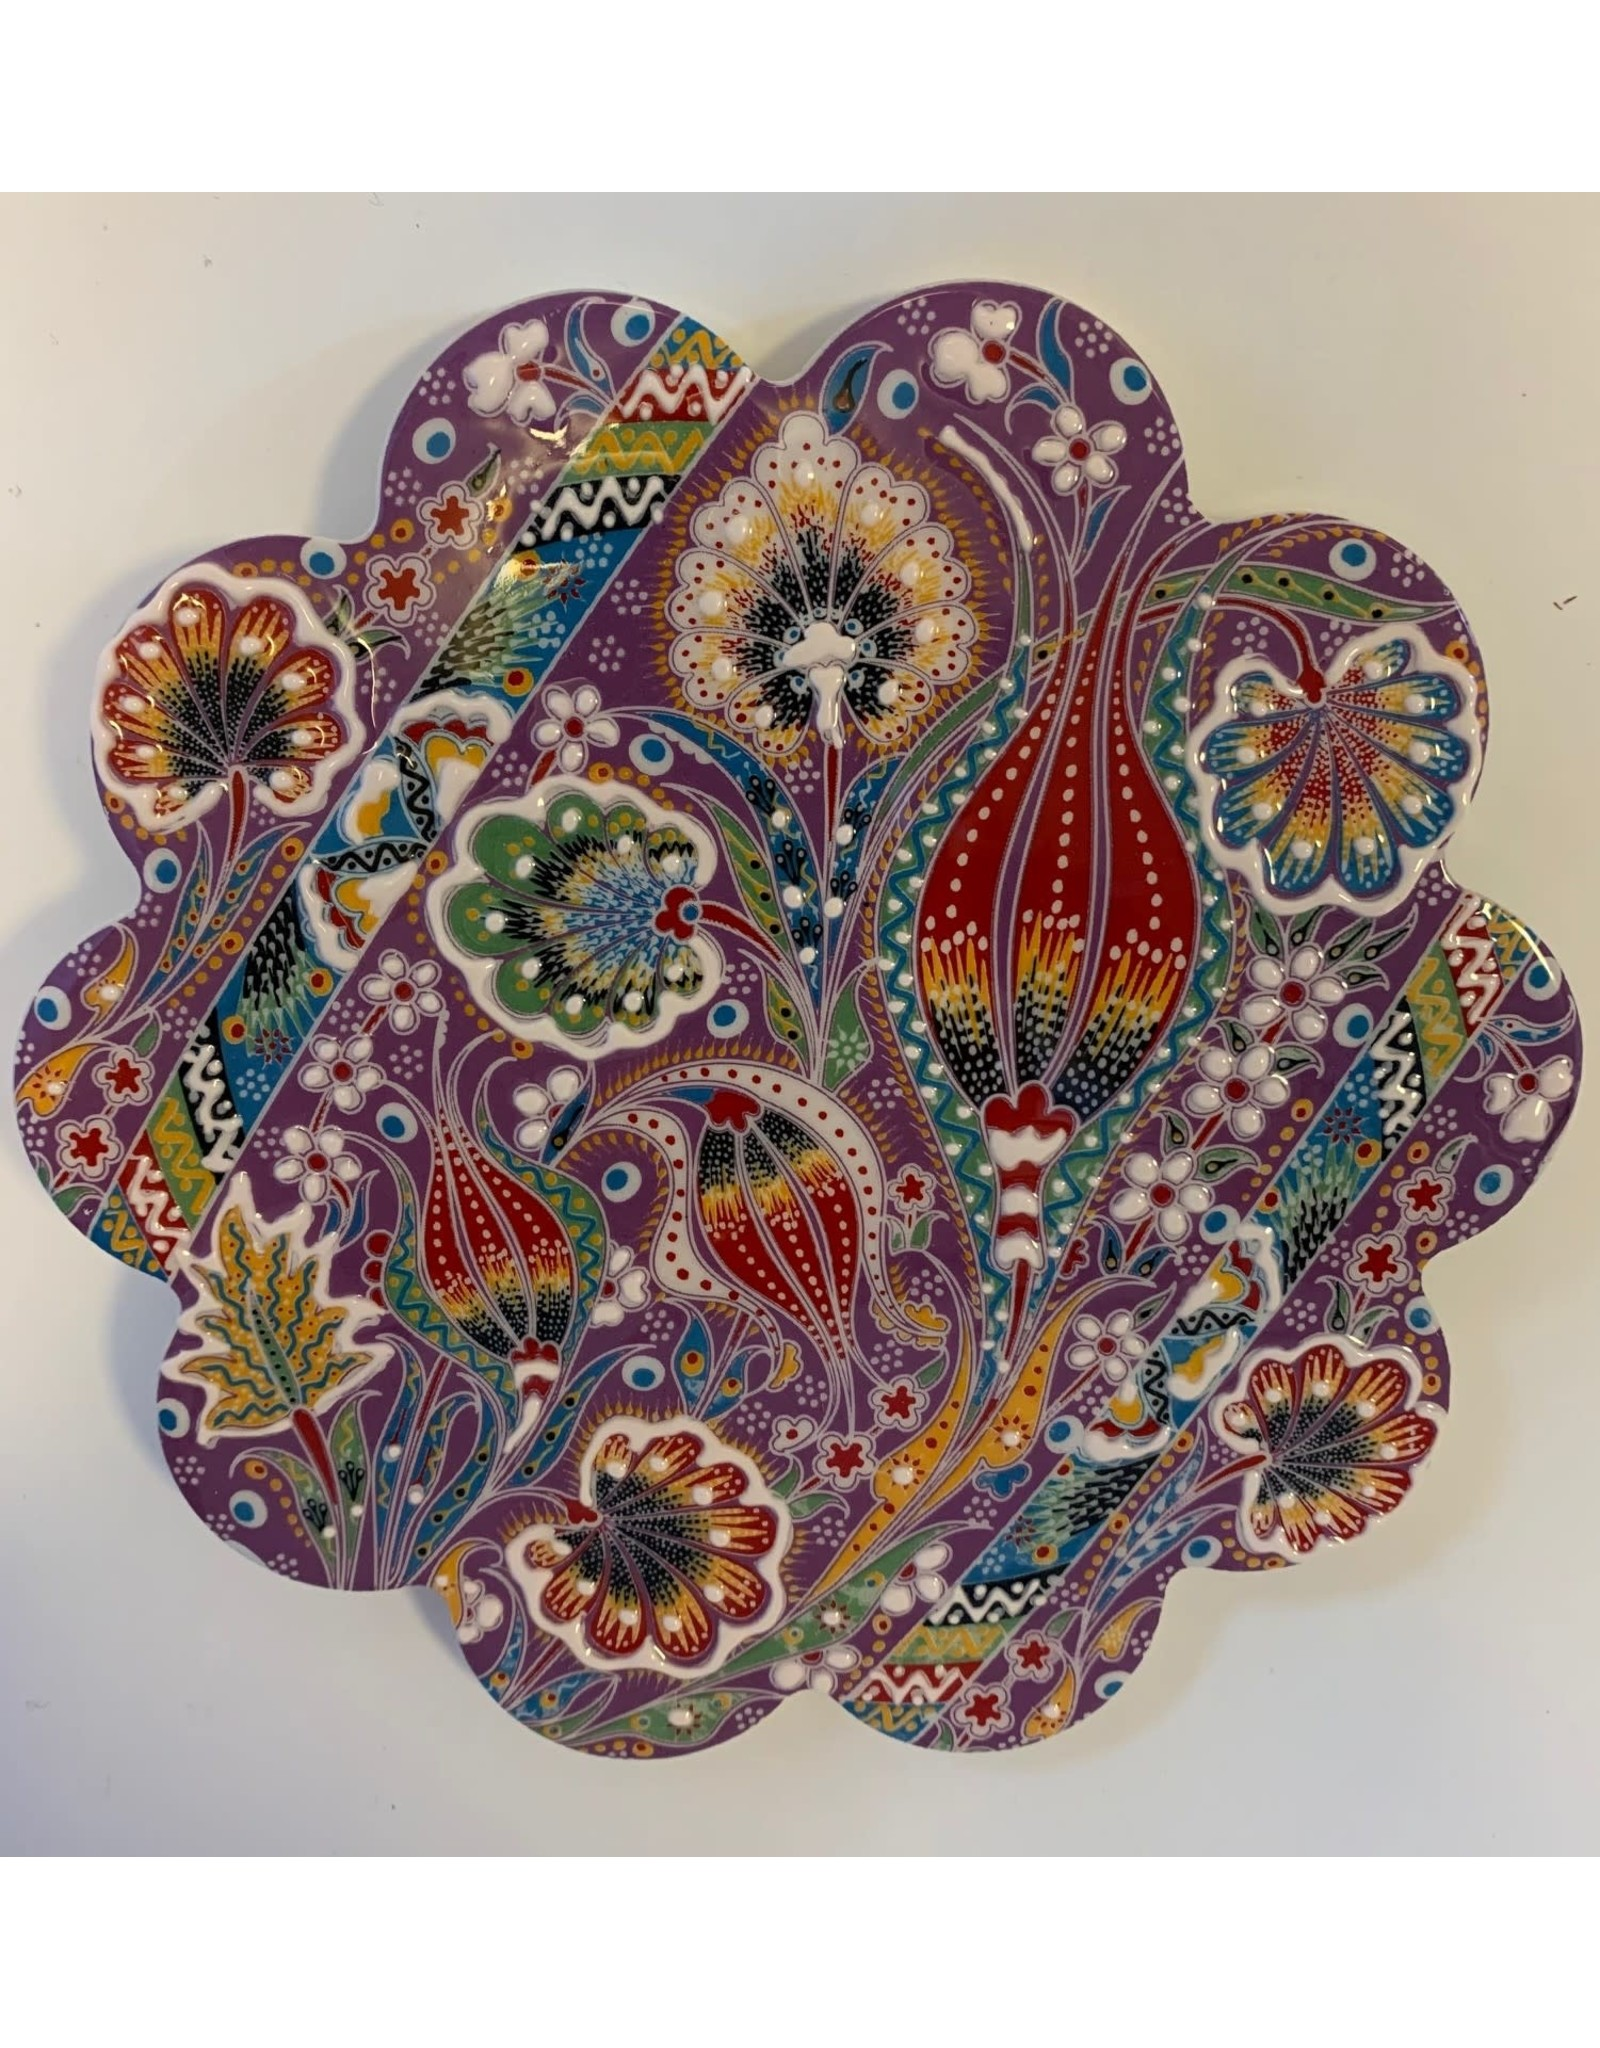 Hand Painted Relief Ceramic Trivet, Purple